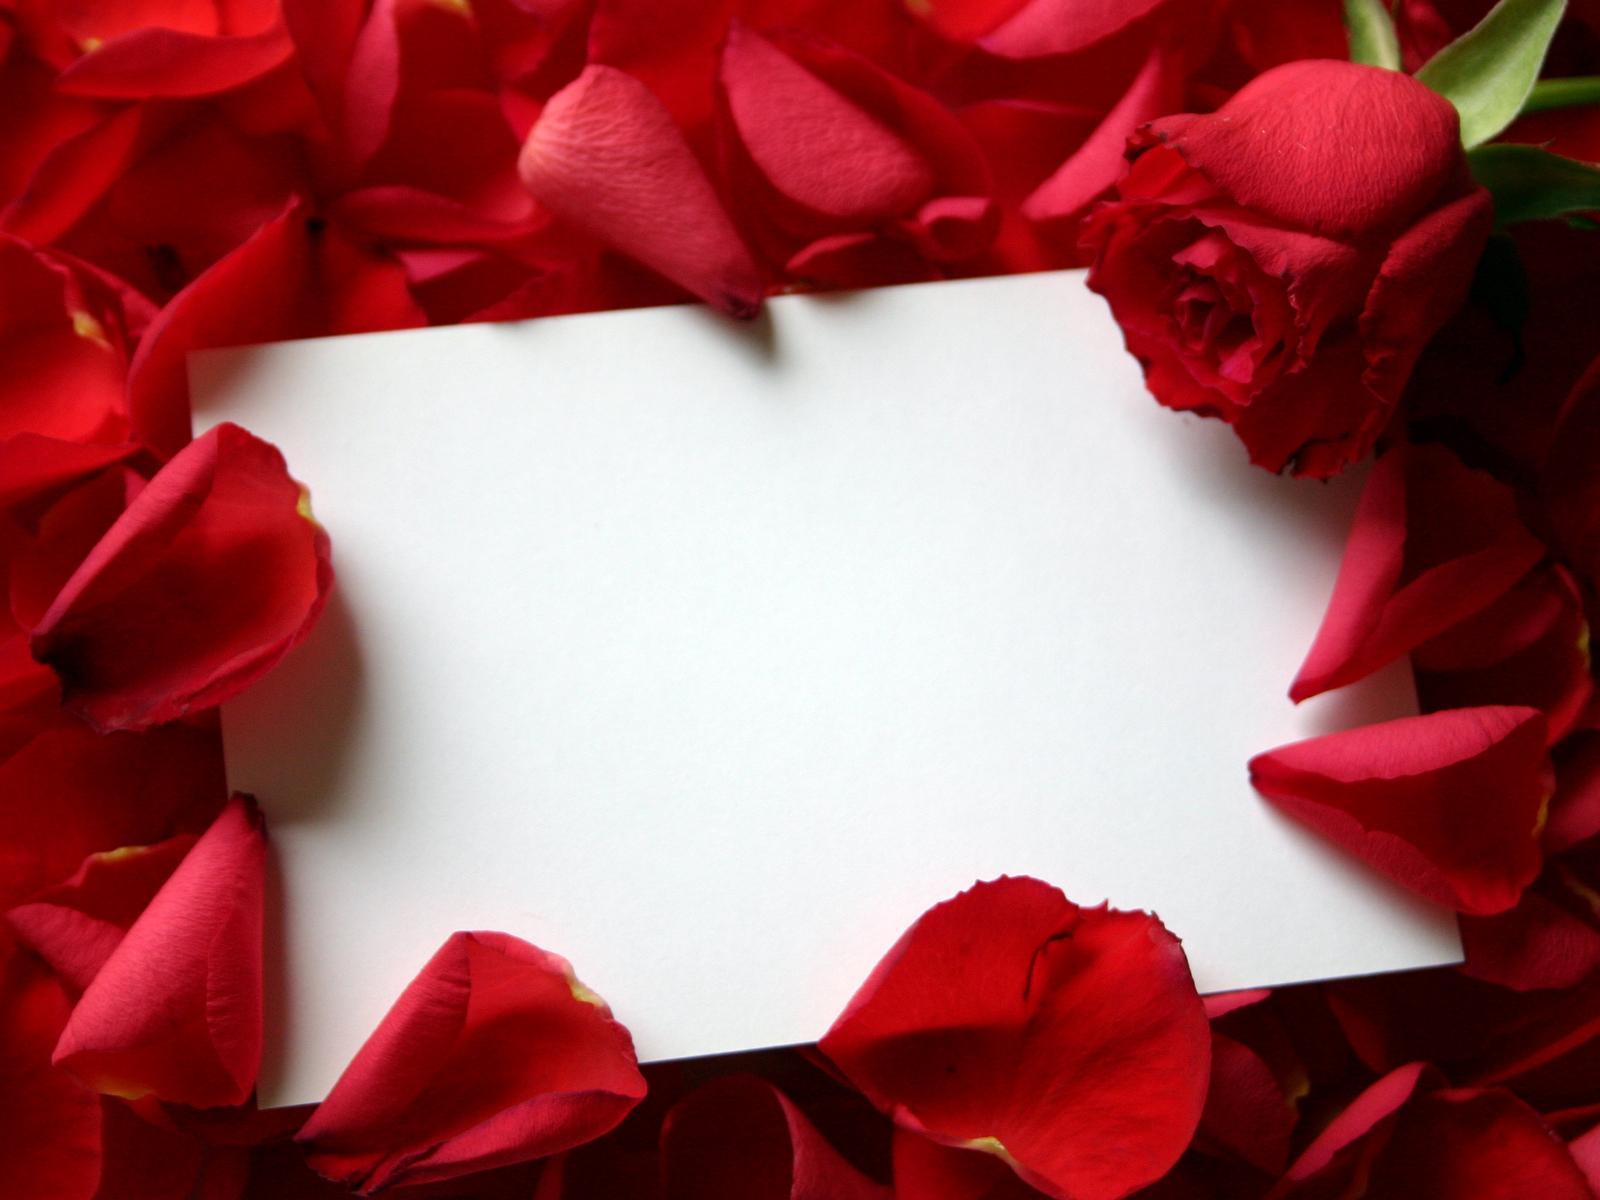 http://3.bp.blogspot.com/-Skoq0zqTrYQ/T0a_LzL_9AI/AAAAAAAADw4/ykVoV849Spg/s1600/roses_love_letter-normal.jpg